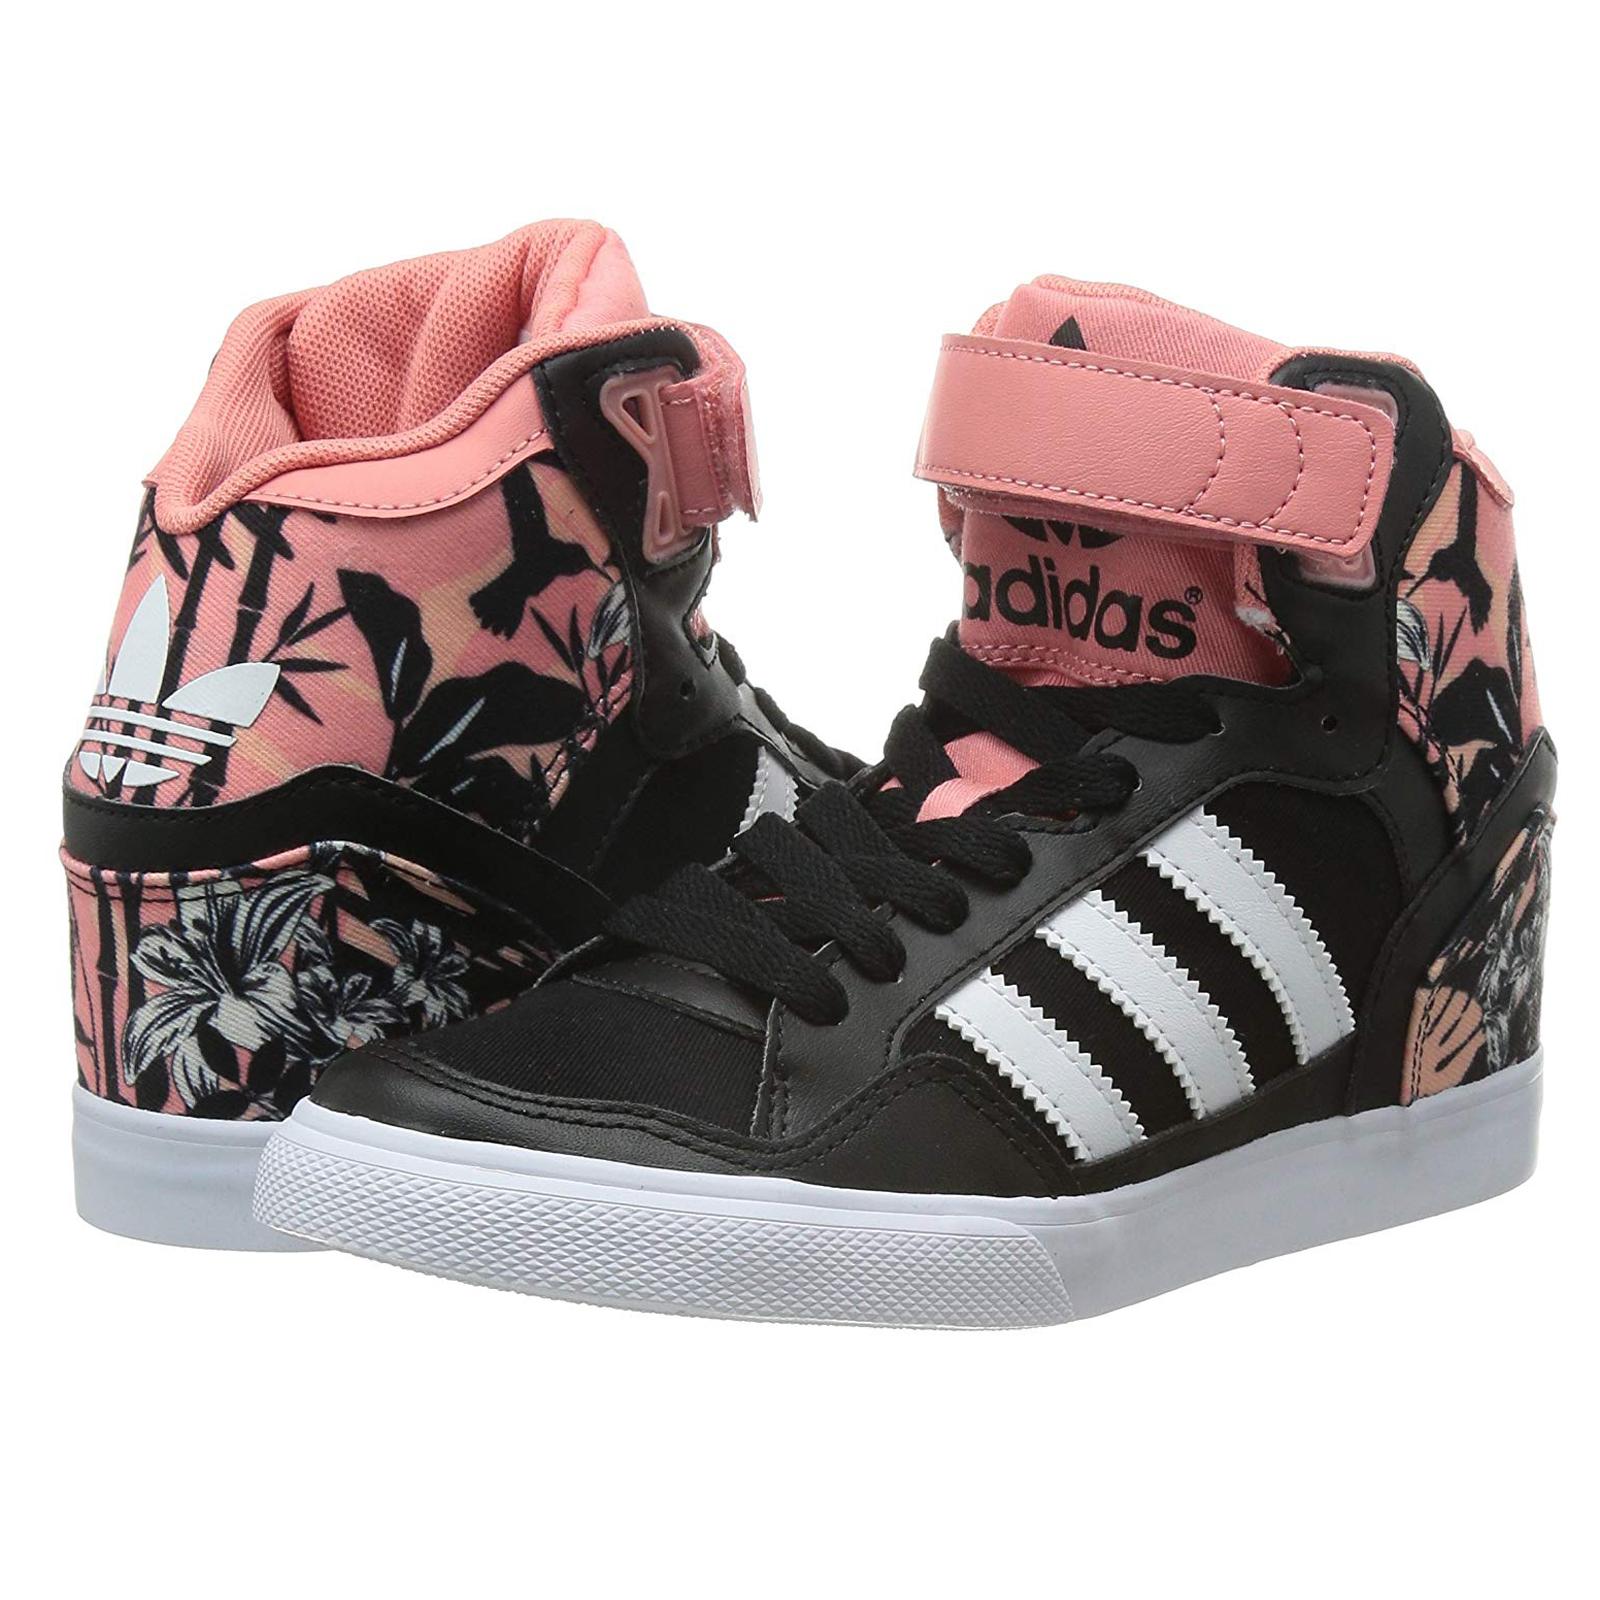 Adidas Originals Extaball up Ladies Sneaker Shoes Wedge Heel Black Rose Blossoms | eBay